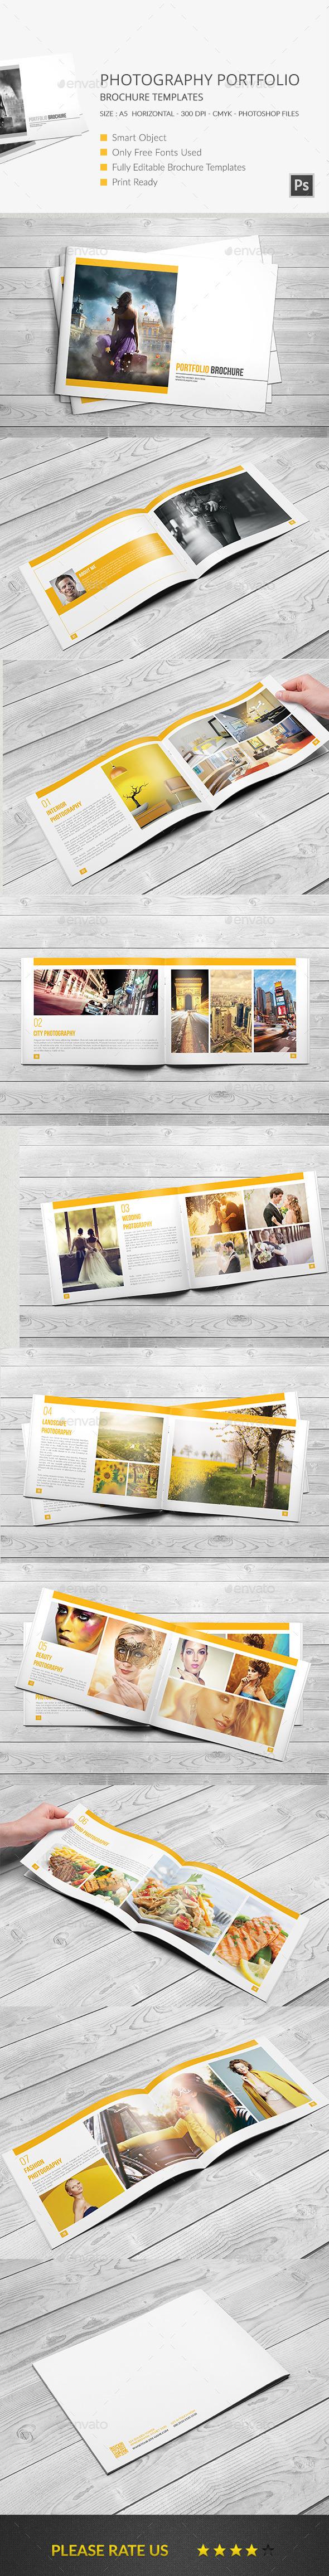 GraphicRiver Photography Portfolio Brochure Template 11226526